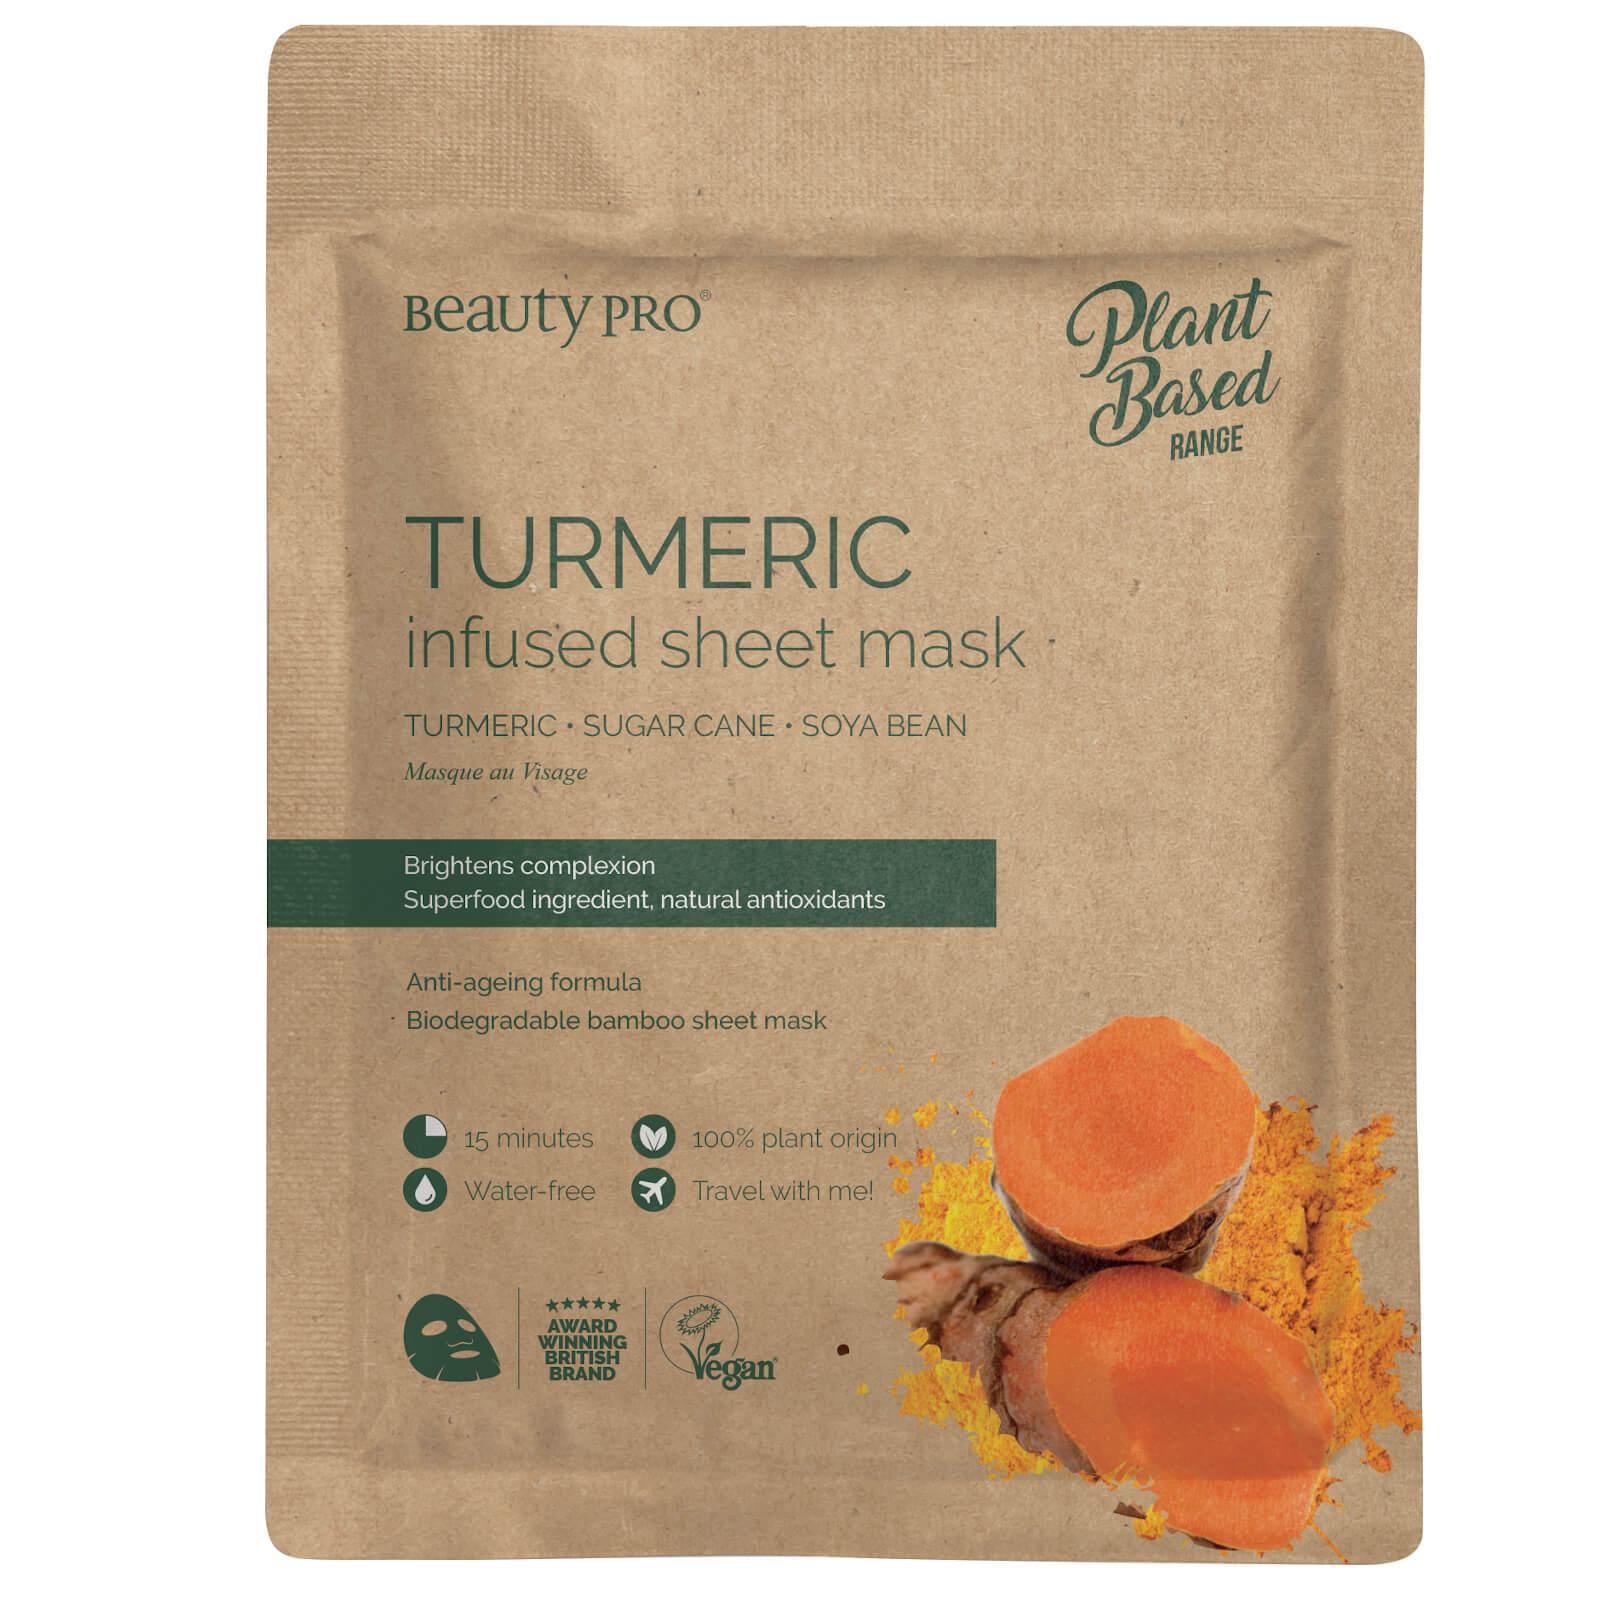 BeautyPro Turmeric Infused Sheet Mask 22ml